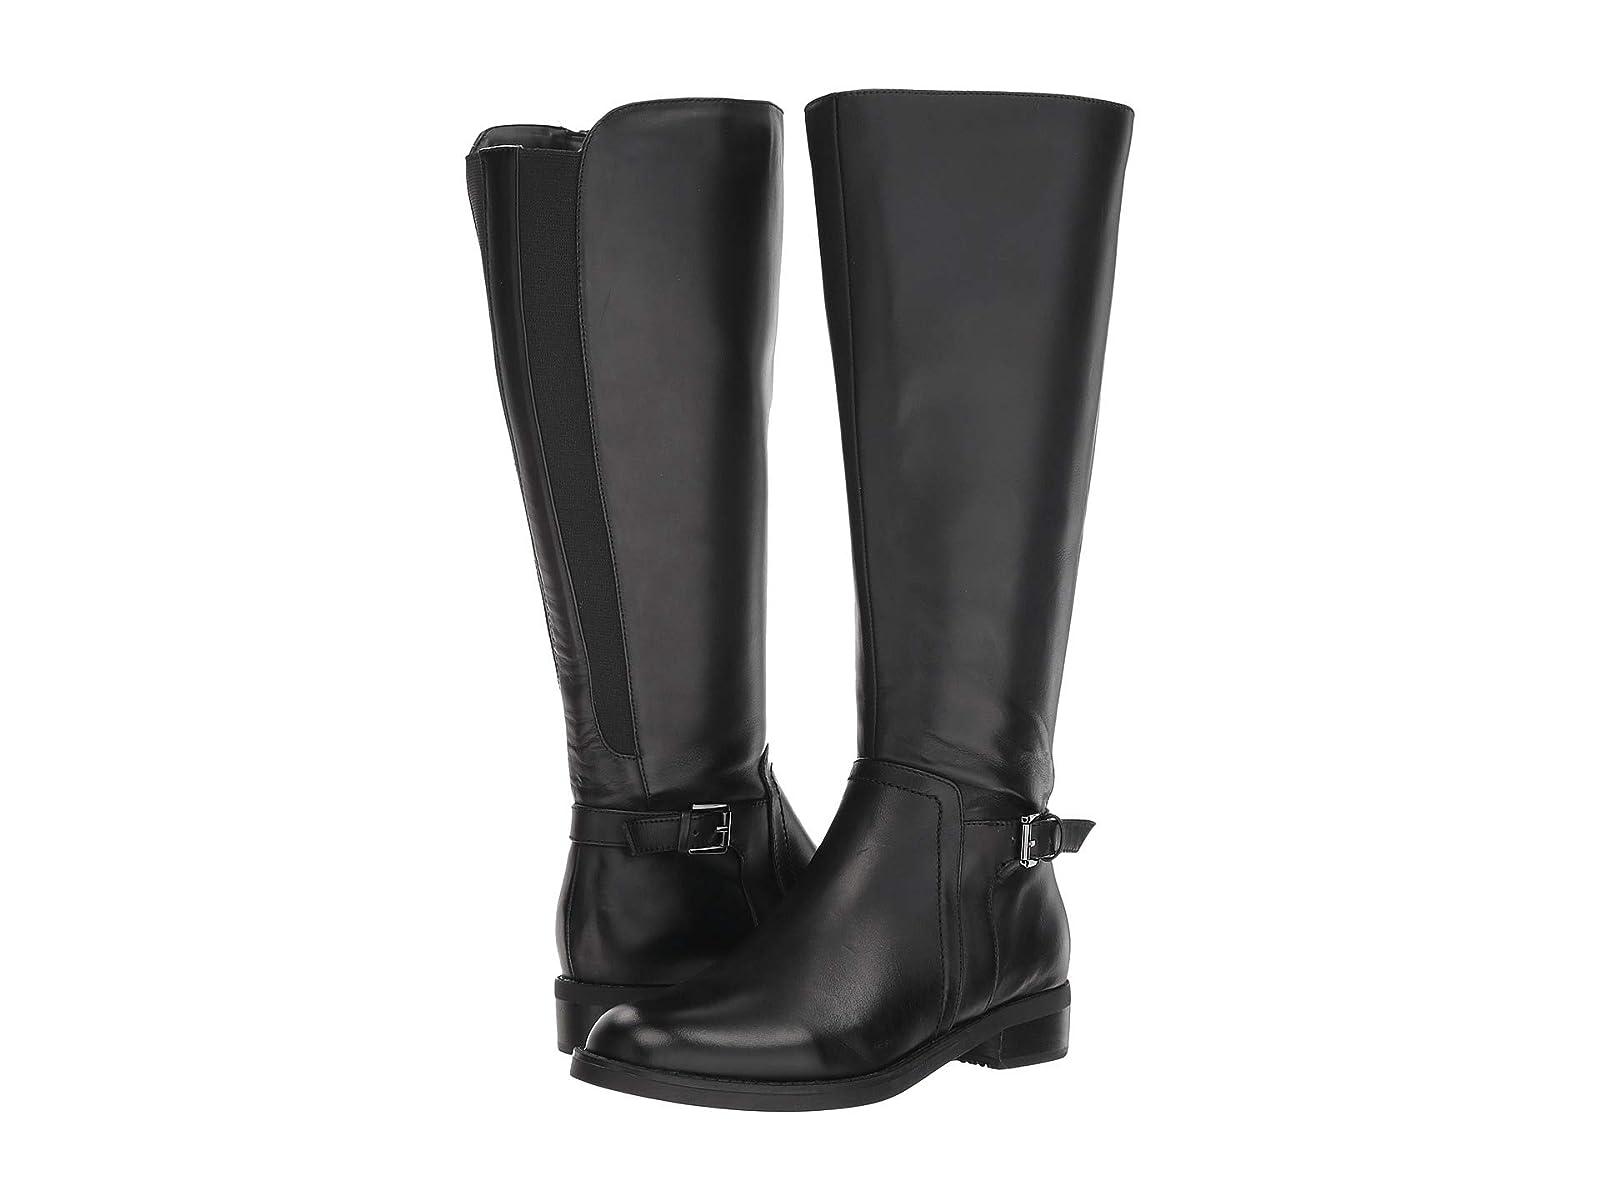 Blondo Evie Wide Shaft Shaft Wide Boot Waterproof d8ea98